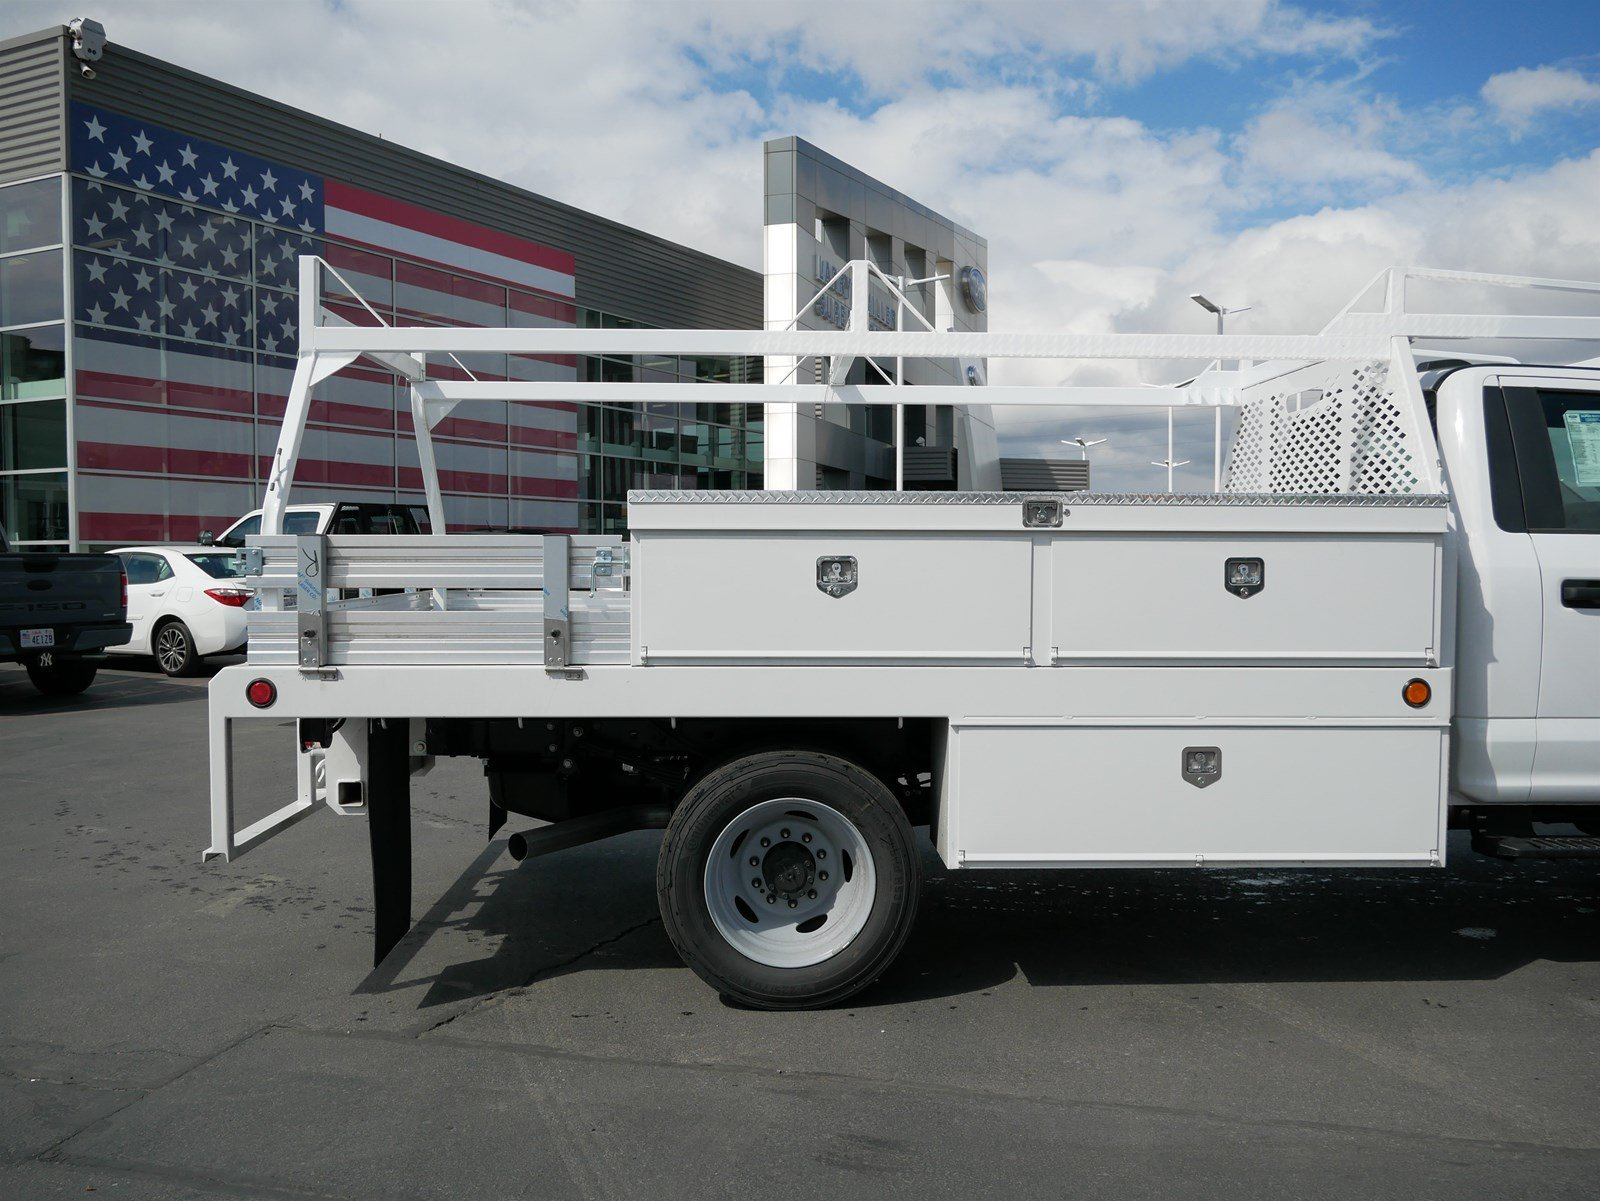 2020 F-550 Regular Cab DRW 4x4, Scelzi CTFB Contractor Body #63072 - photo 11